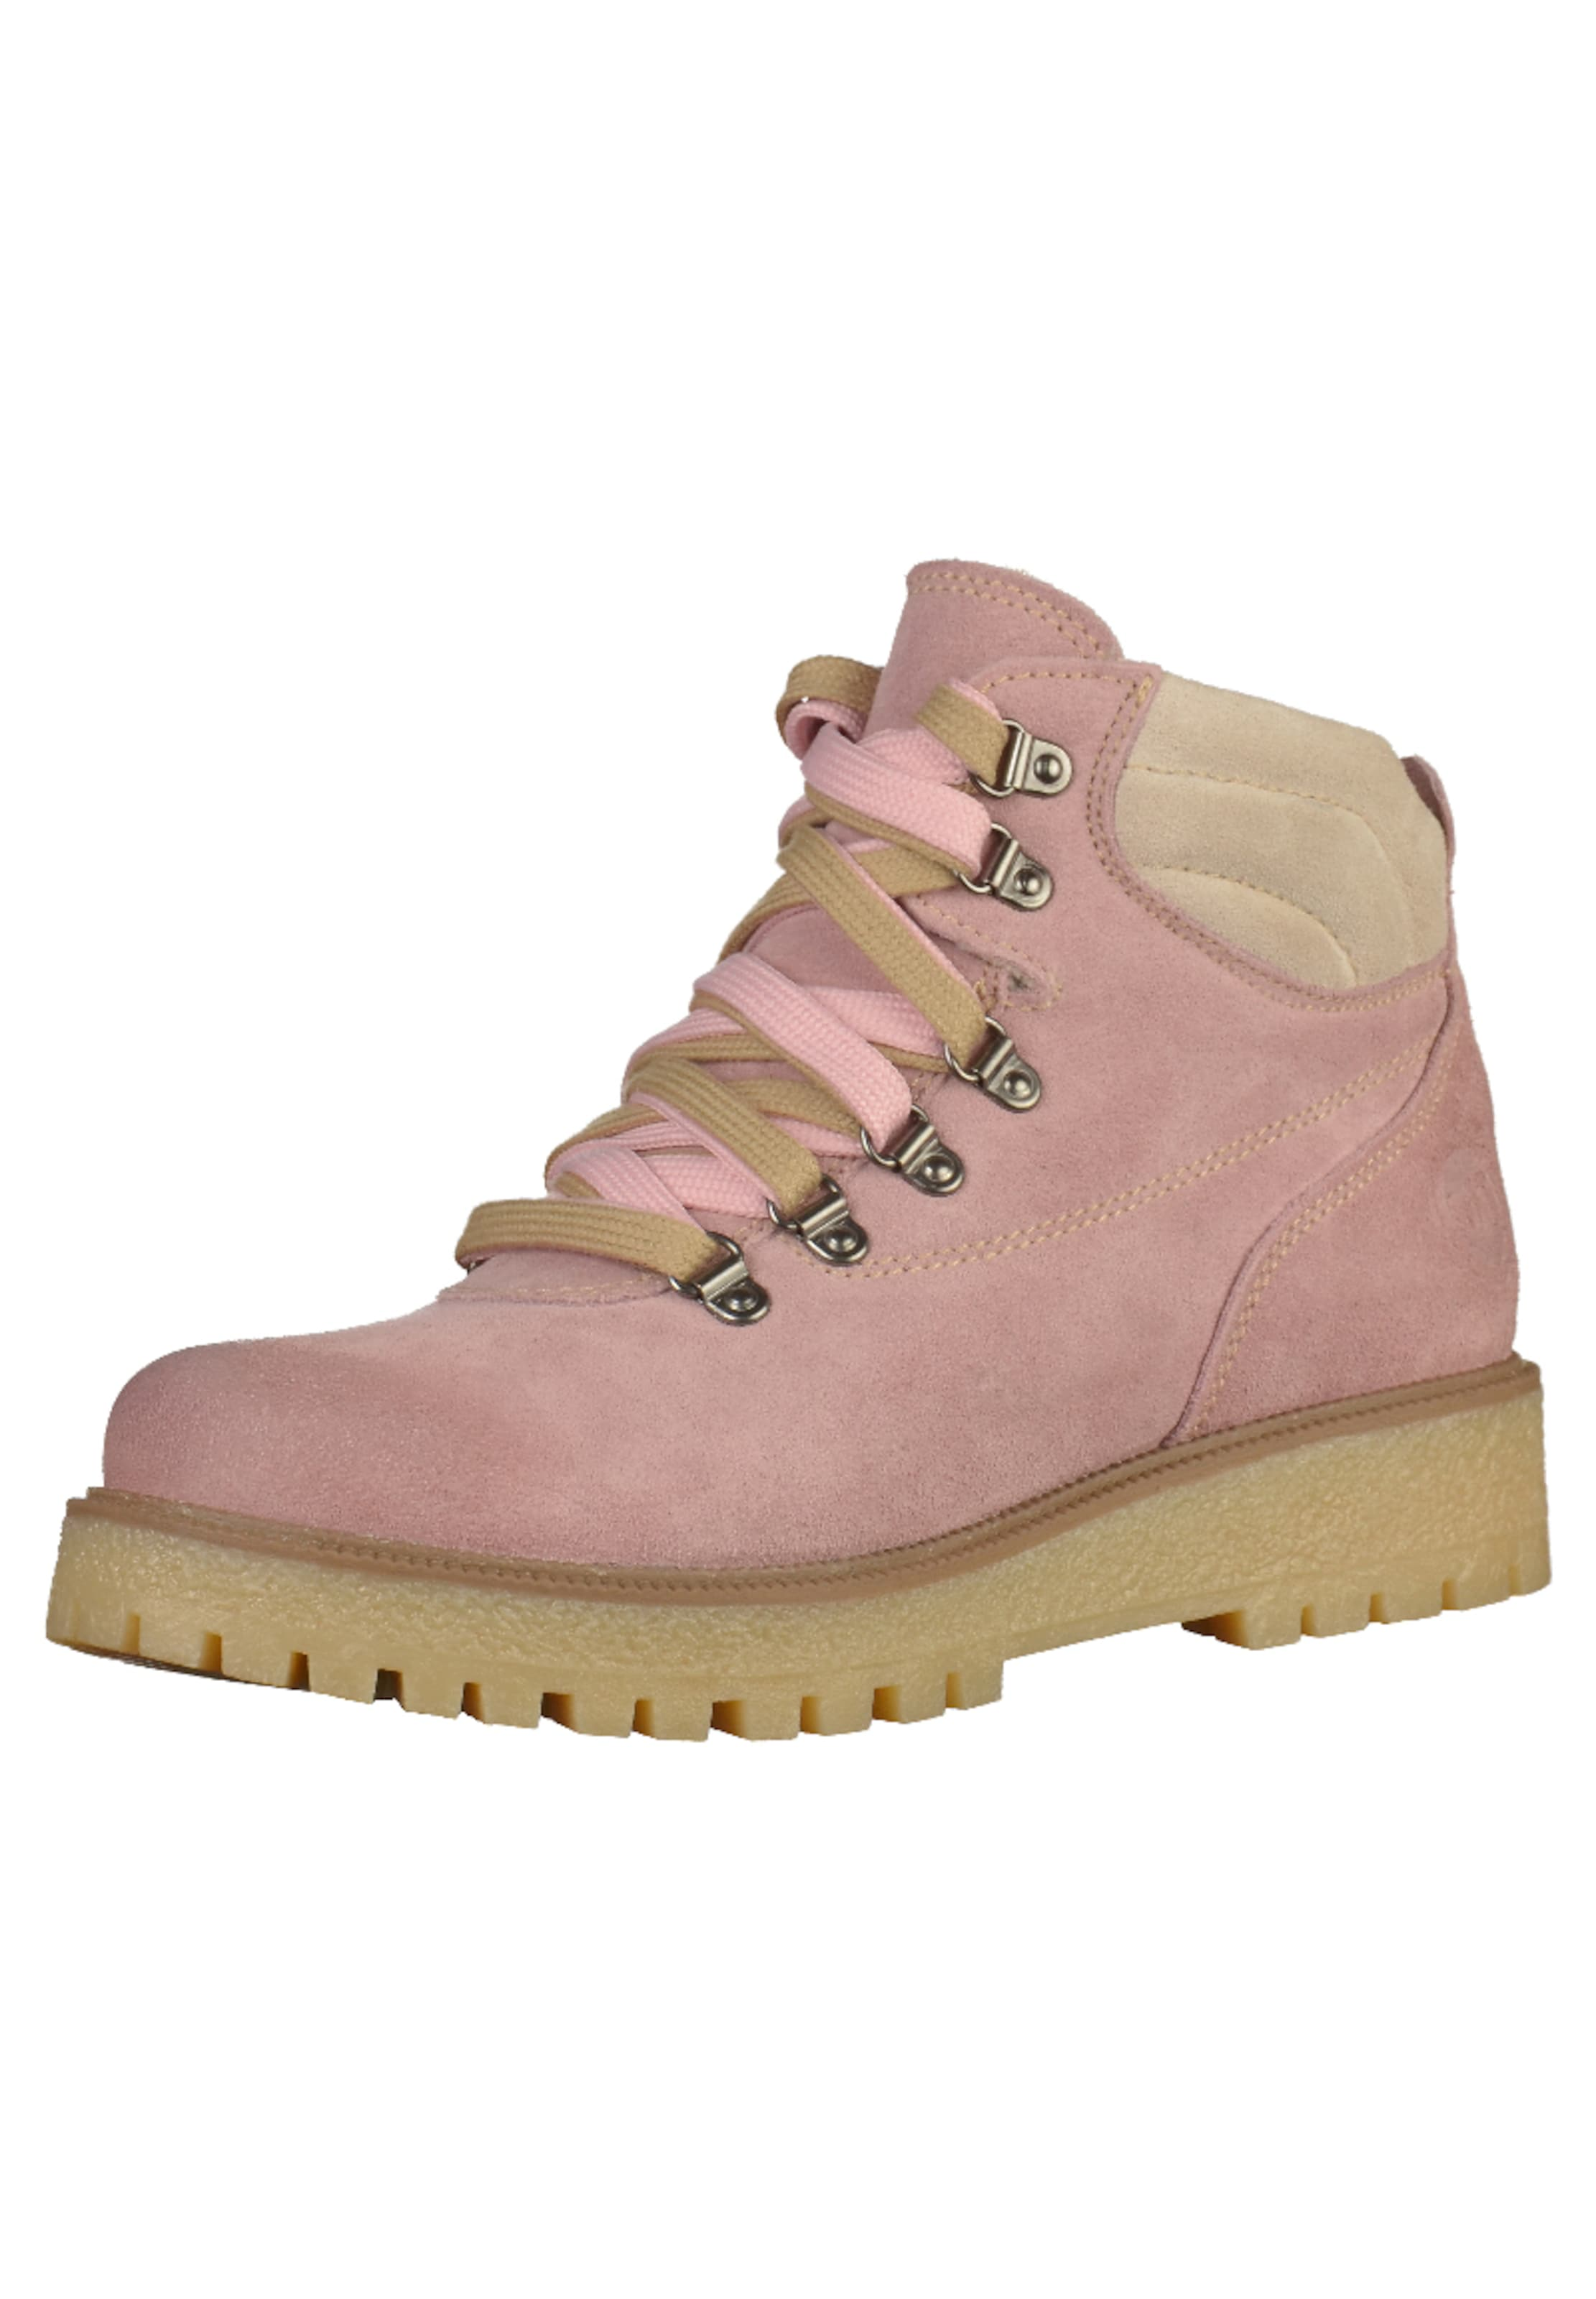 Haltbare Mode billige Schuhe MARCO TOZZI getragene | Stiefelette Schuhe Gut getragene TOZZI Schuhe 9f89b2